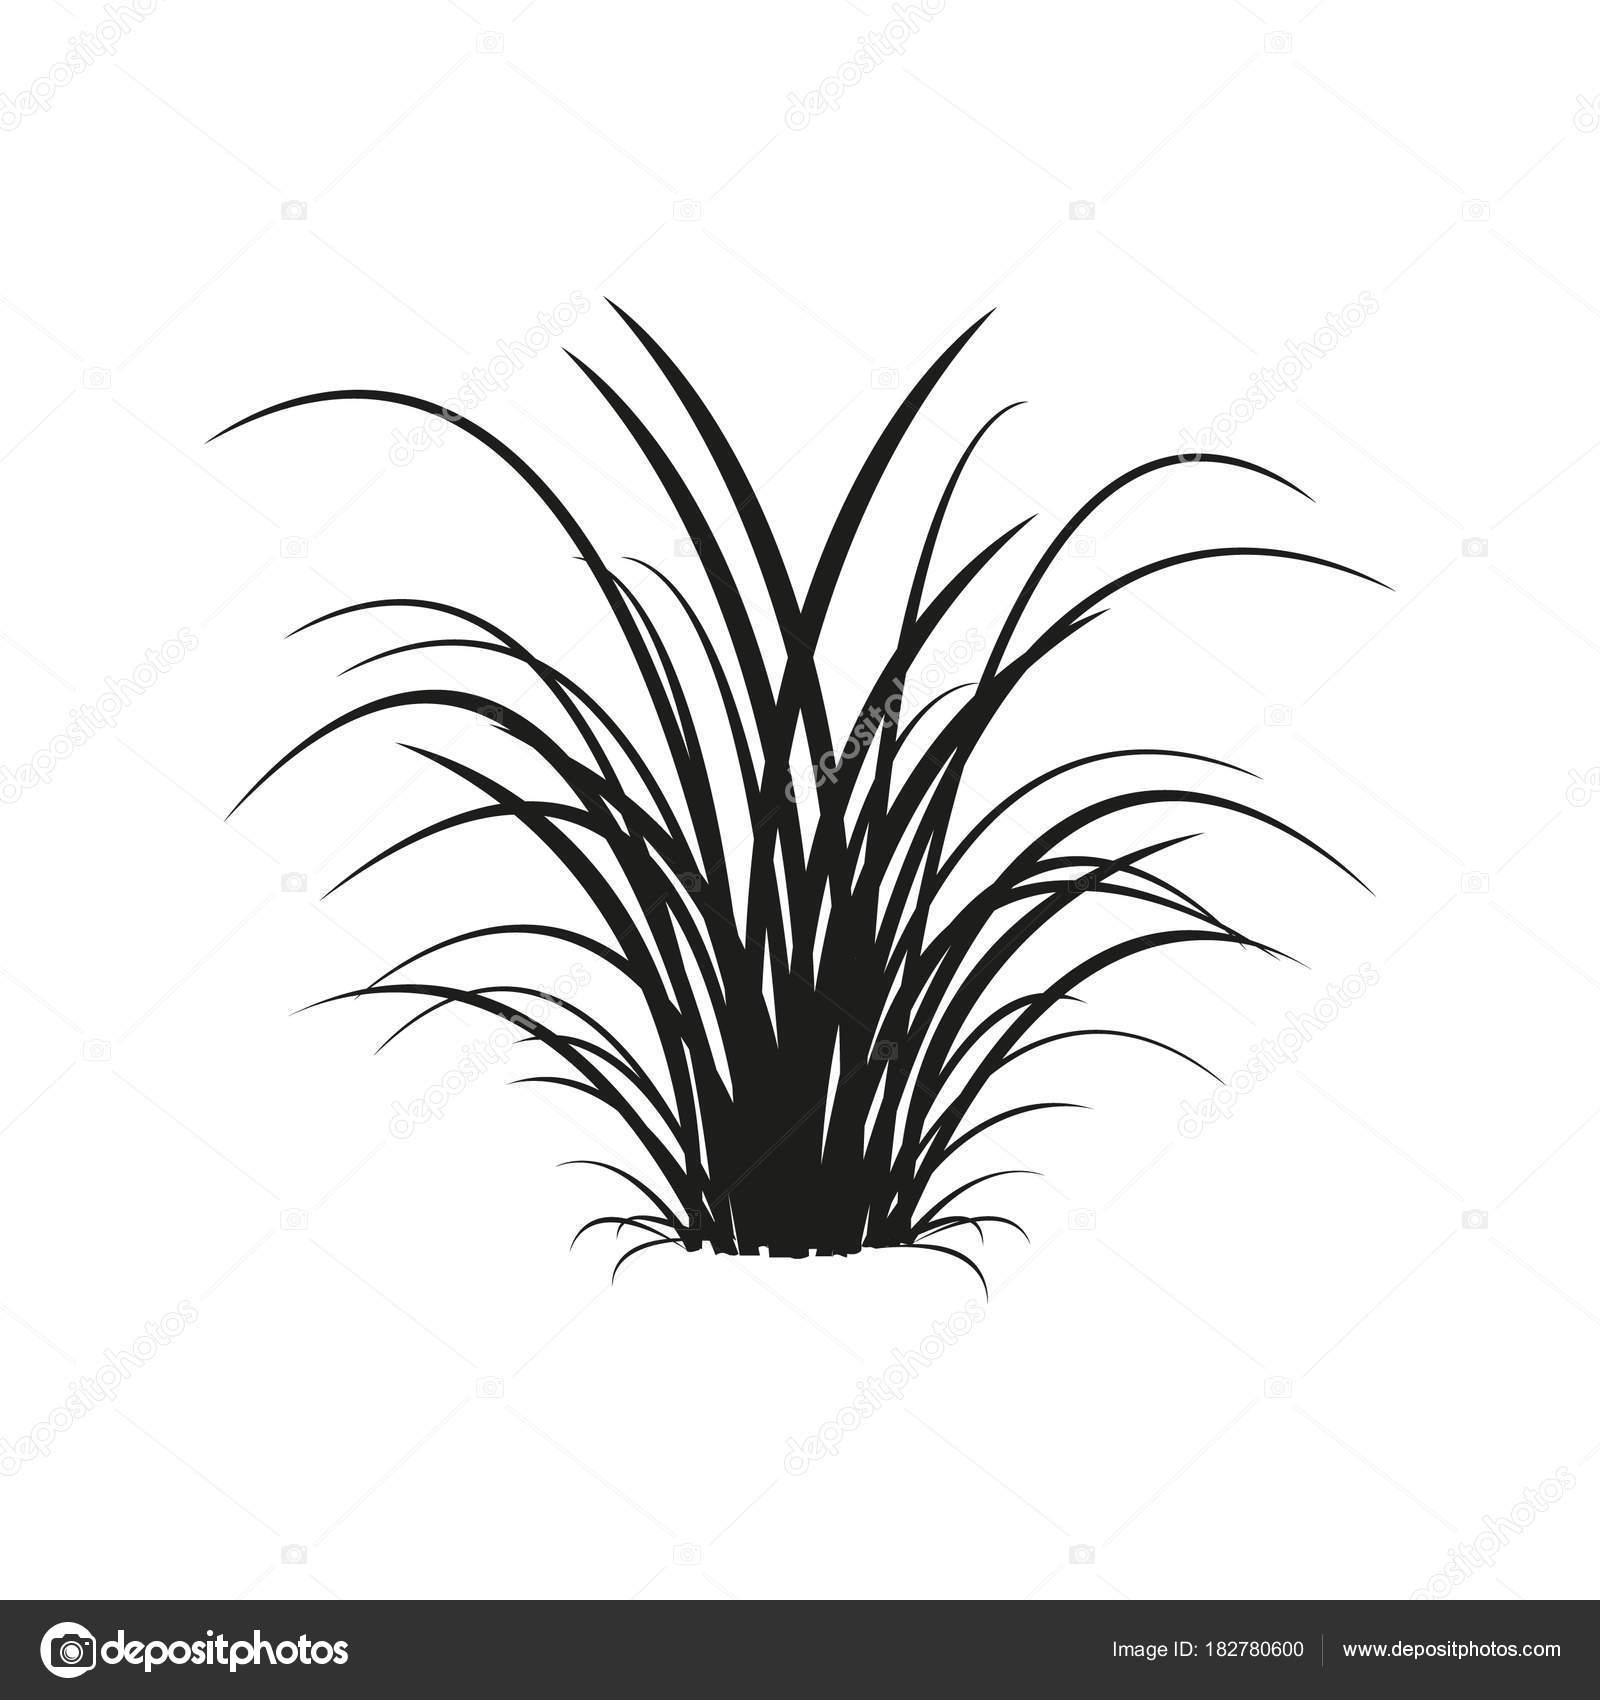 icon grass vector illustration stock vector c schaste 182780600 https depositphotos com 182780600 stock illustration icon grass vector illustration html